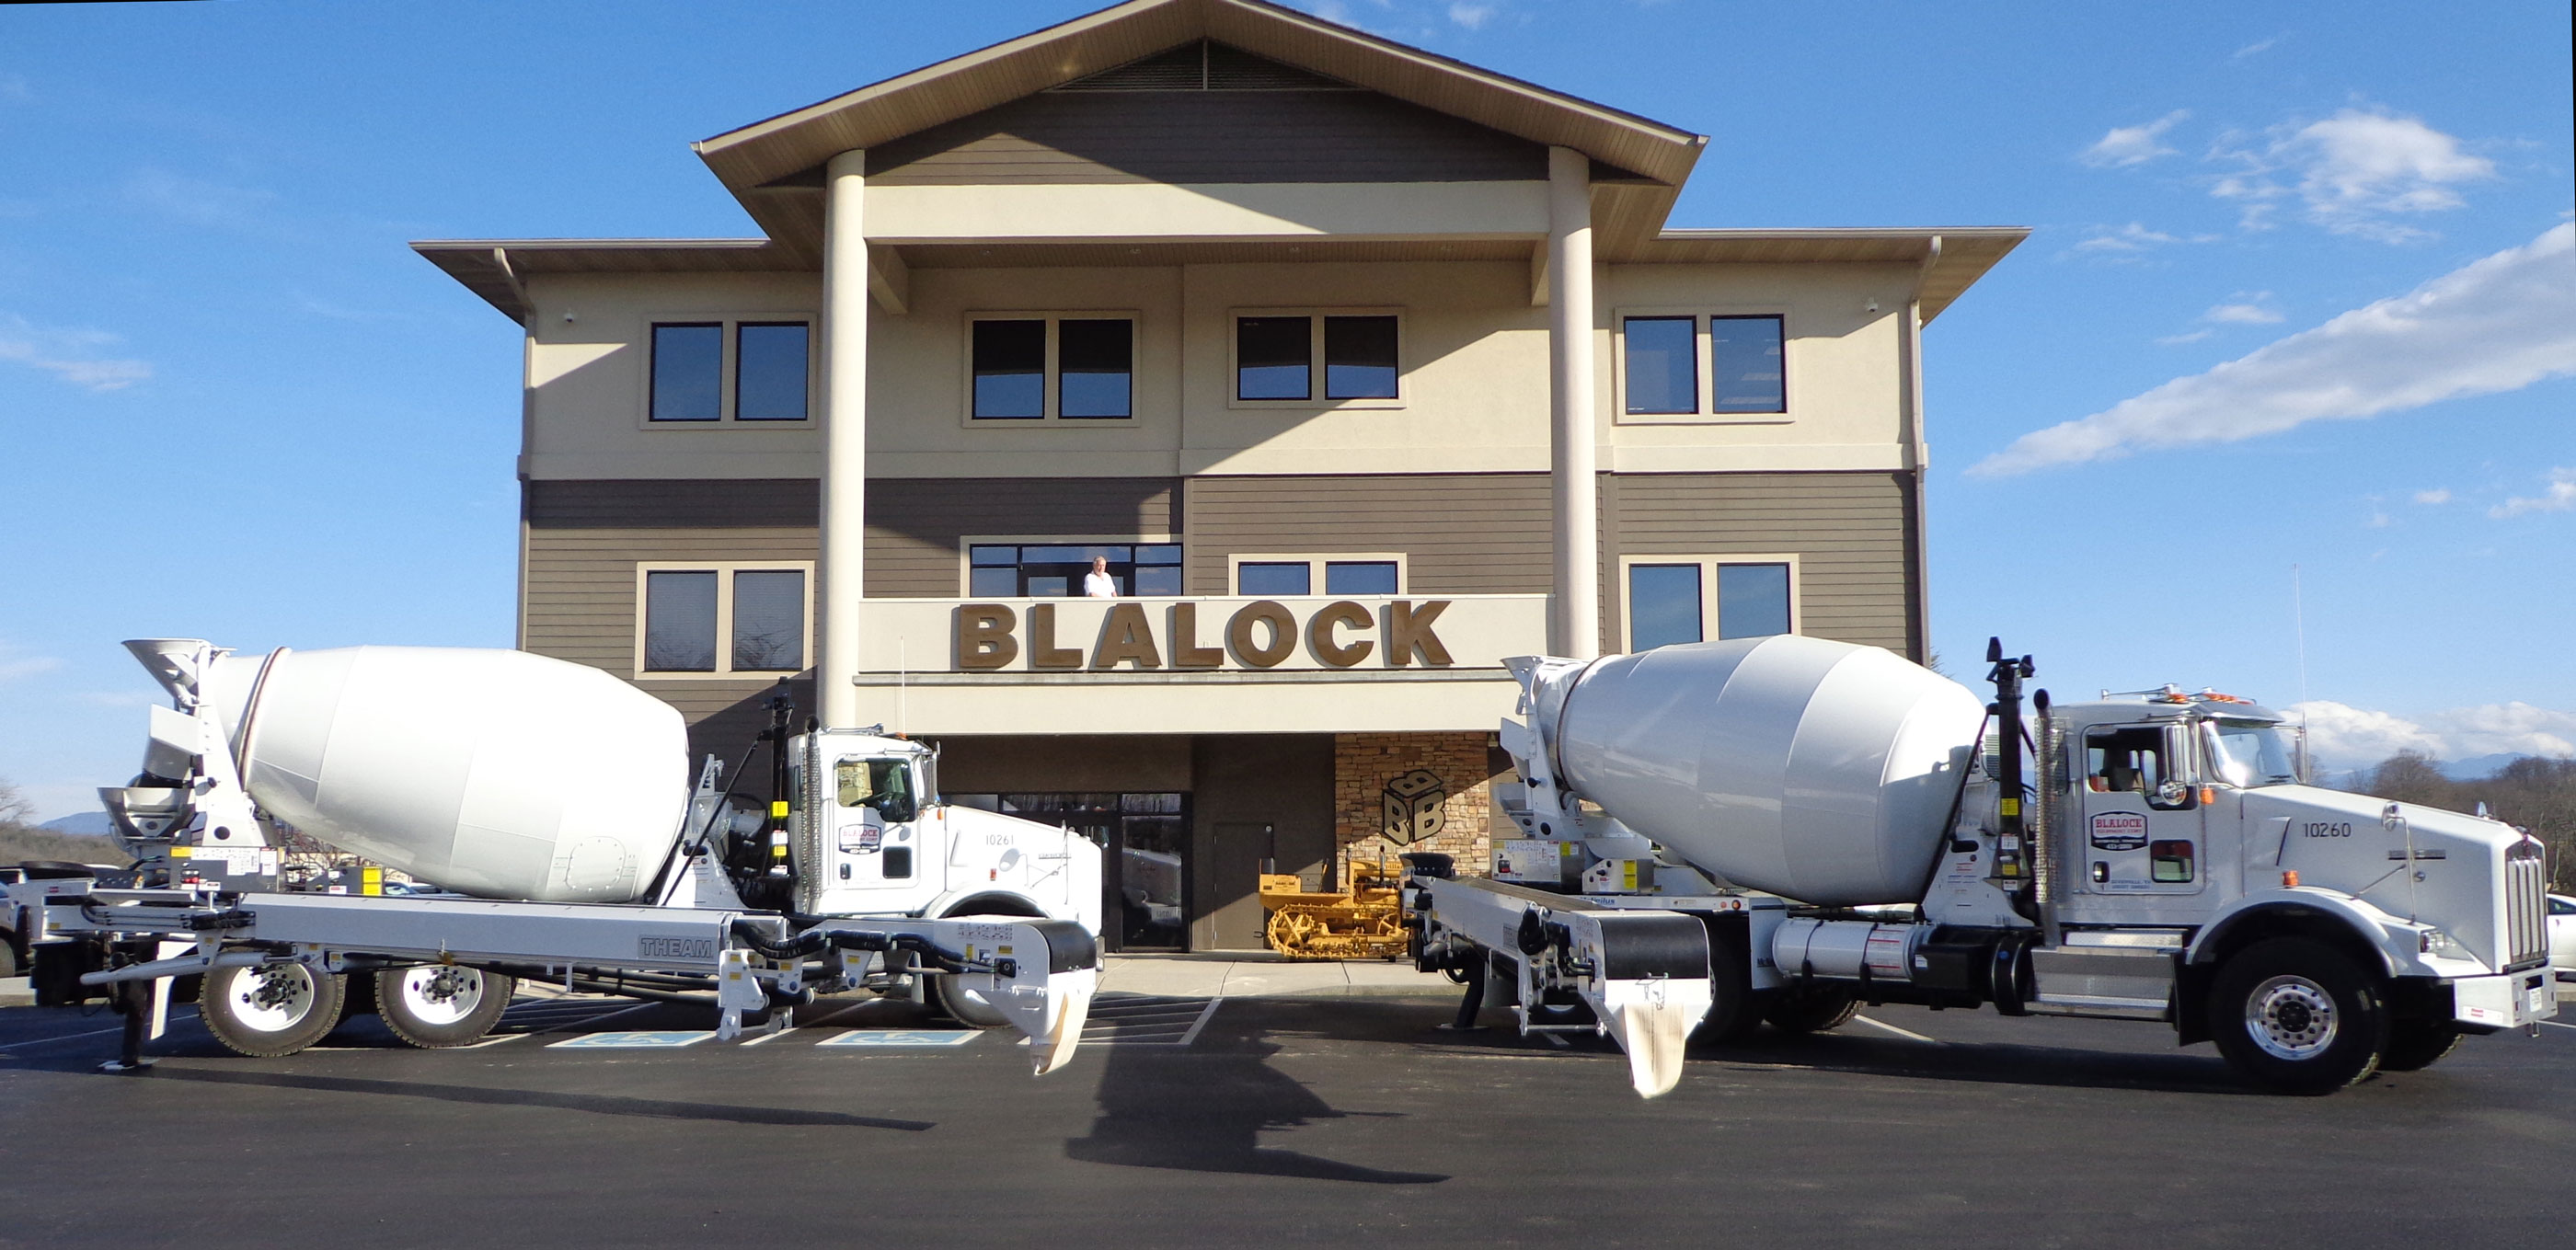 blalock tls theam conveyor concrete mixer placing